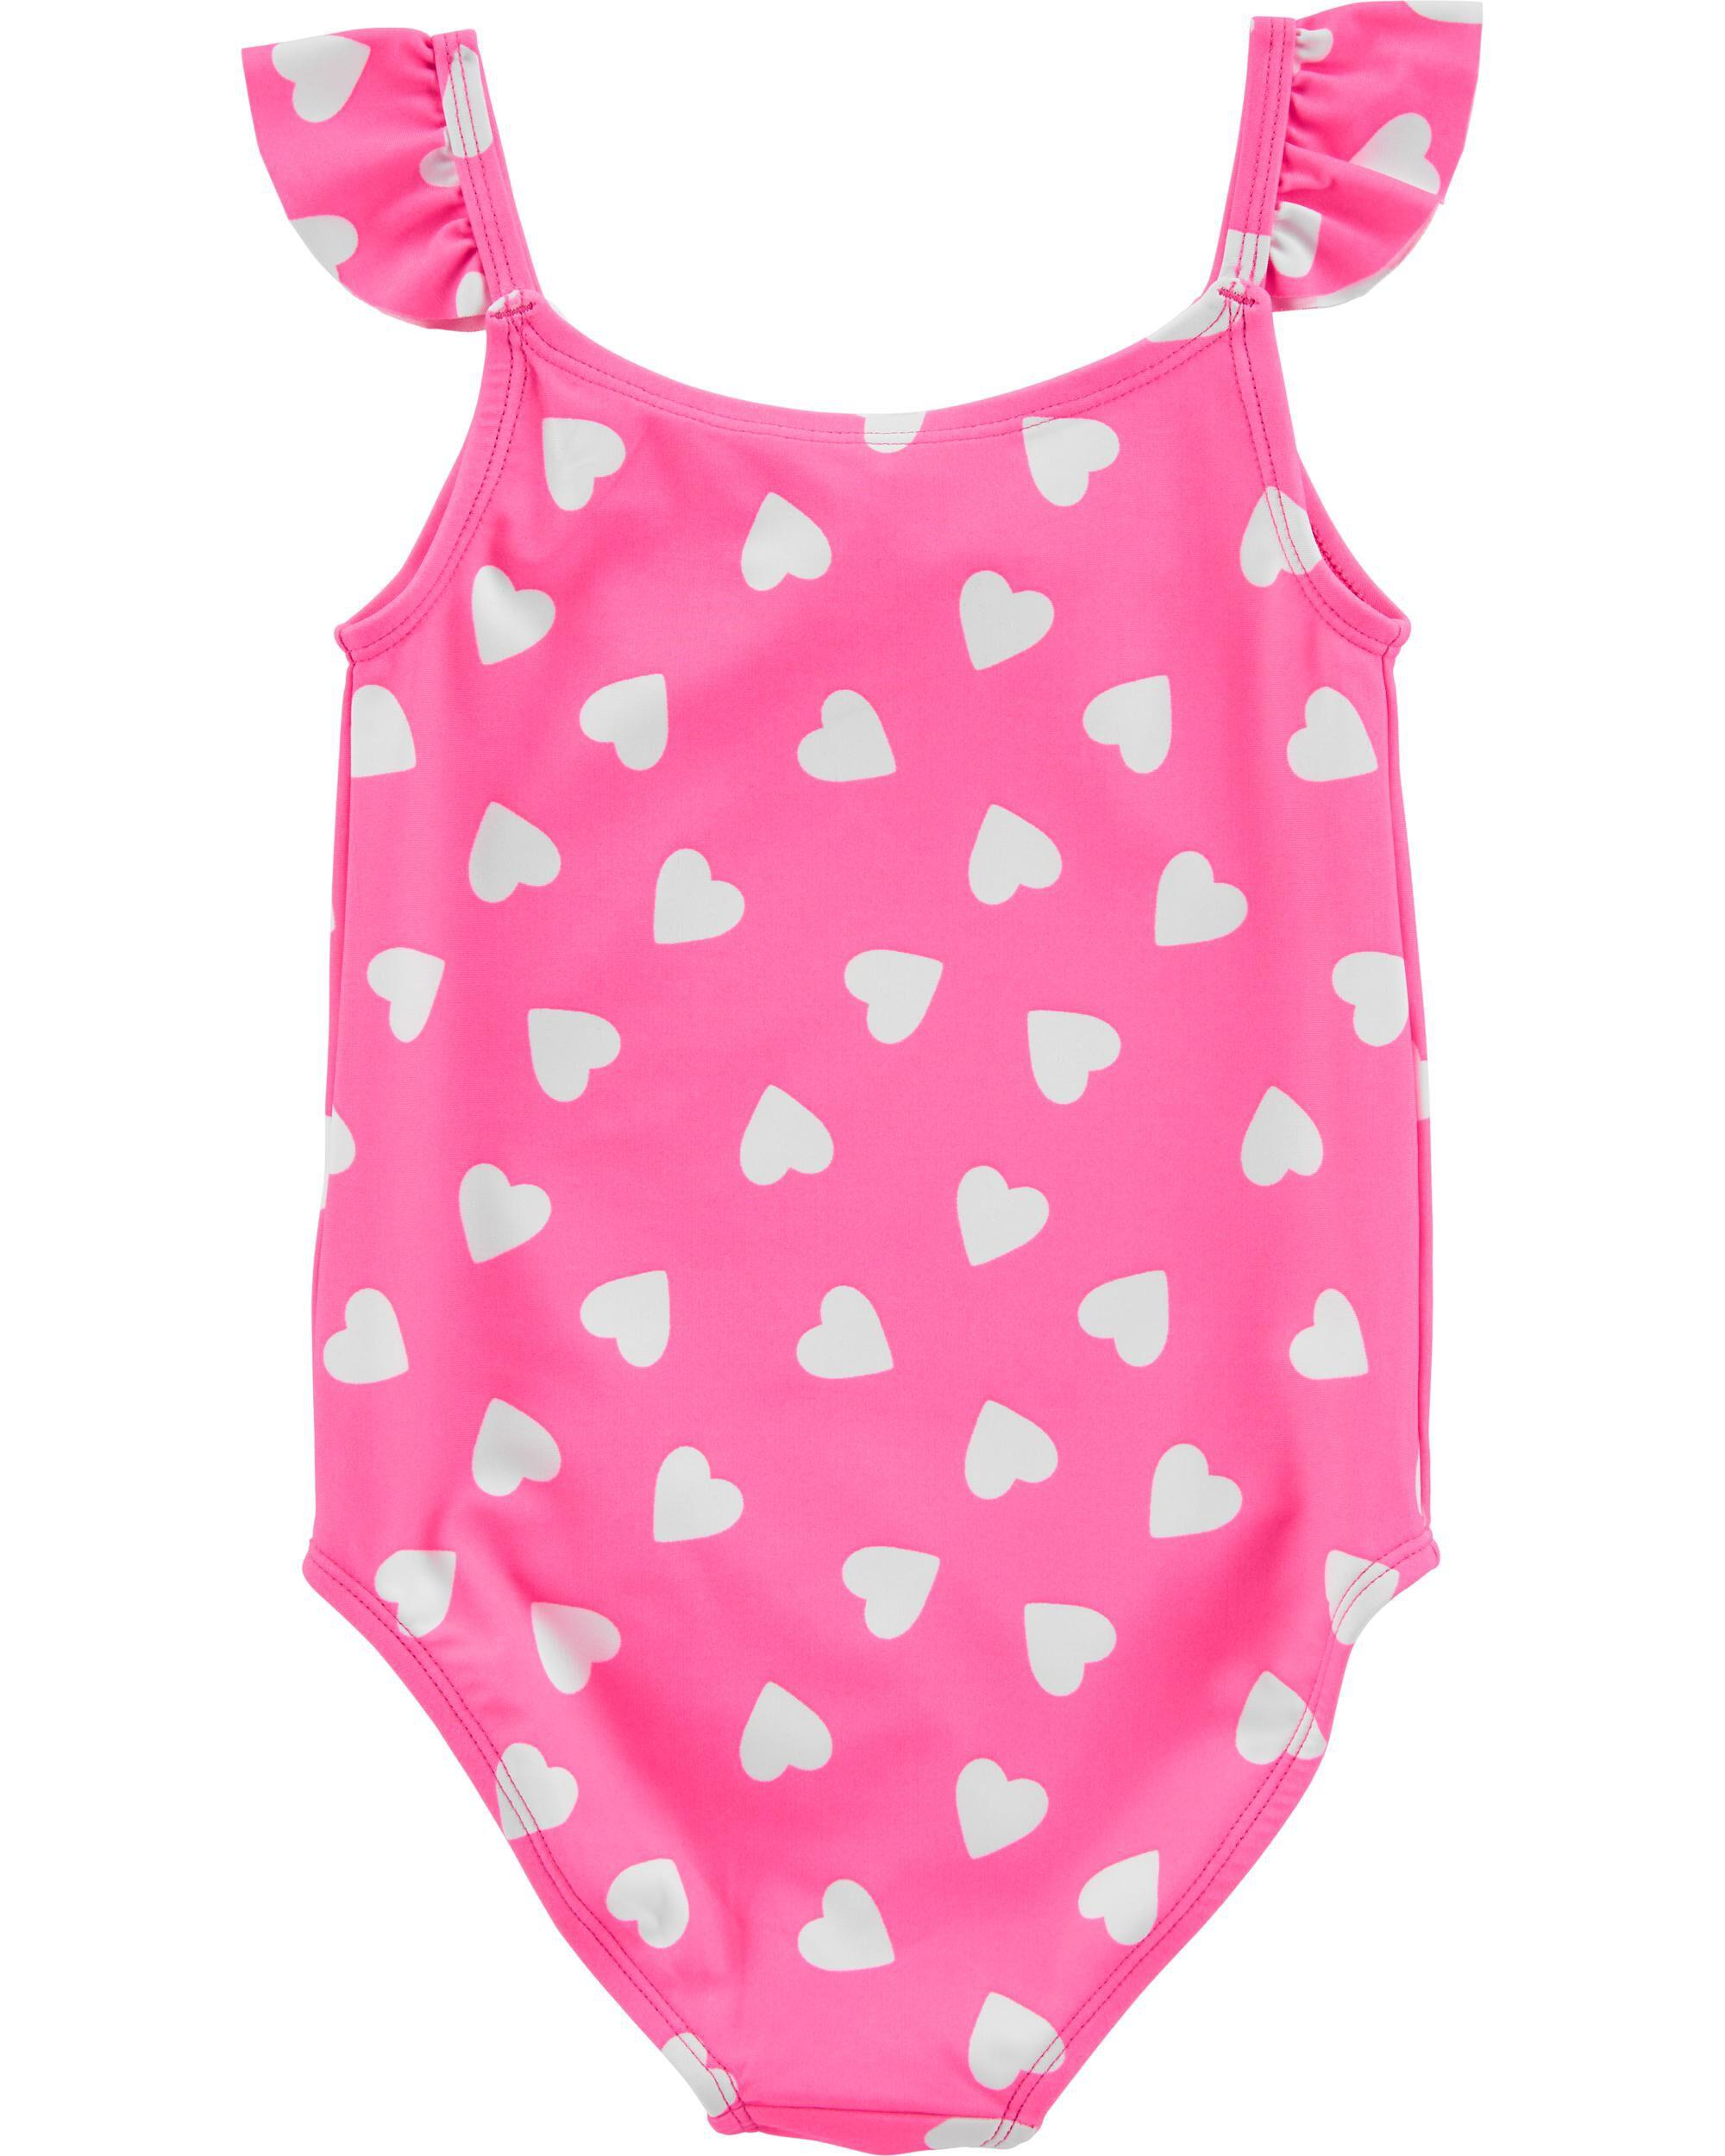 Baby Girl Carters Flamingo One-Piece Swimsuit Beach Pool Fun Size 12M New